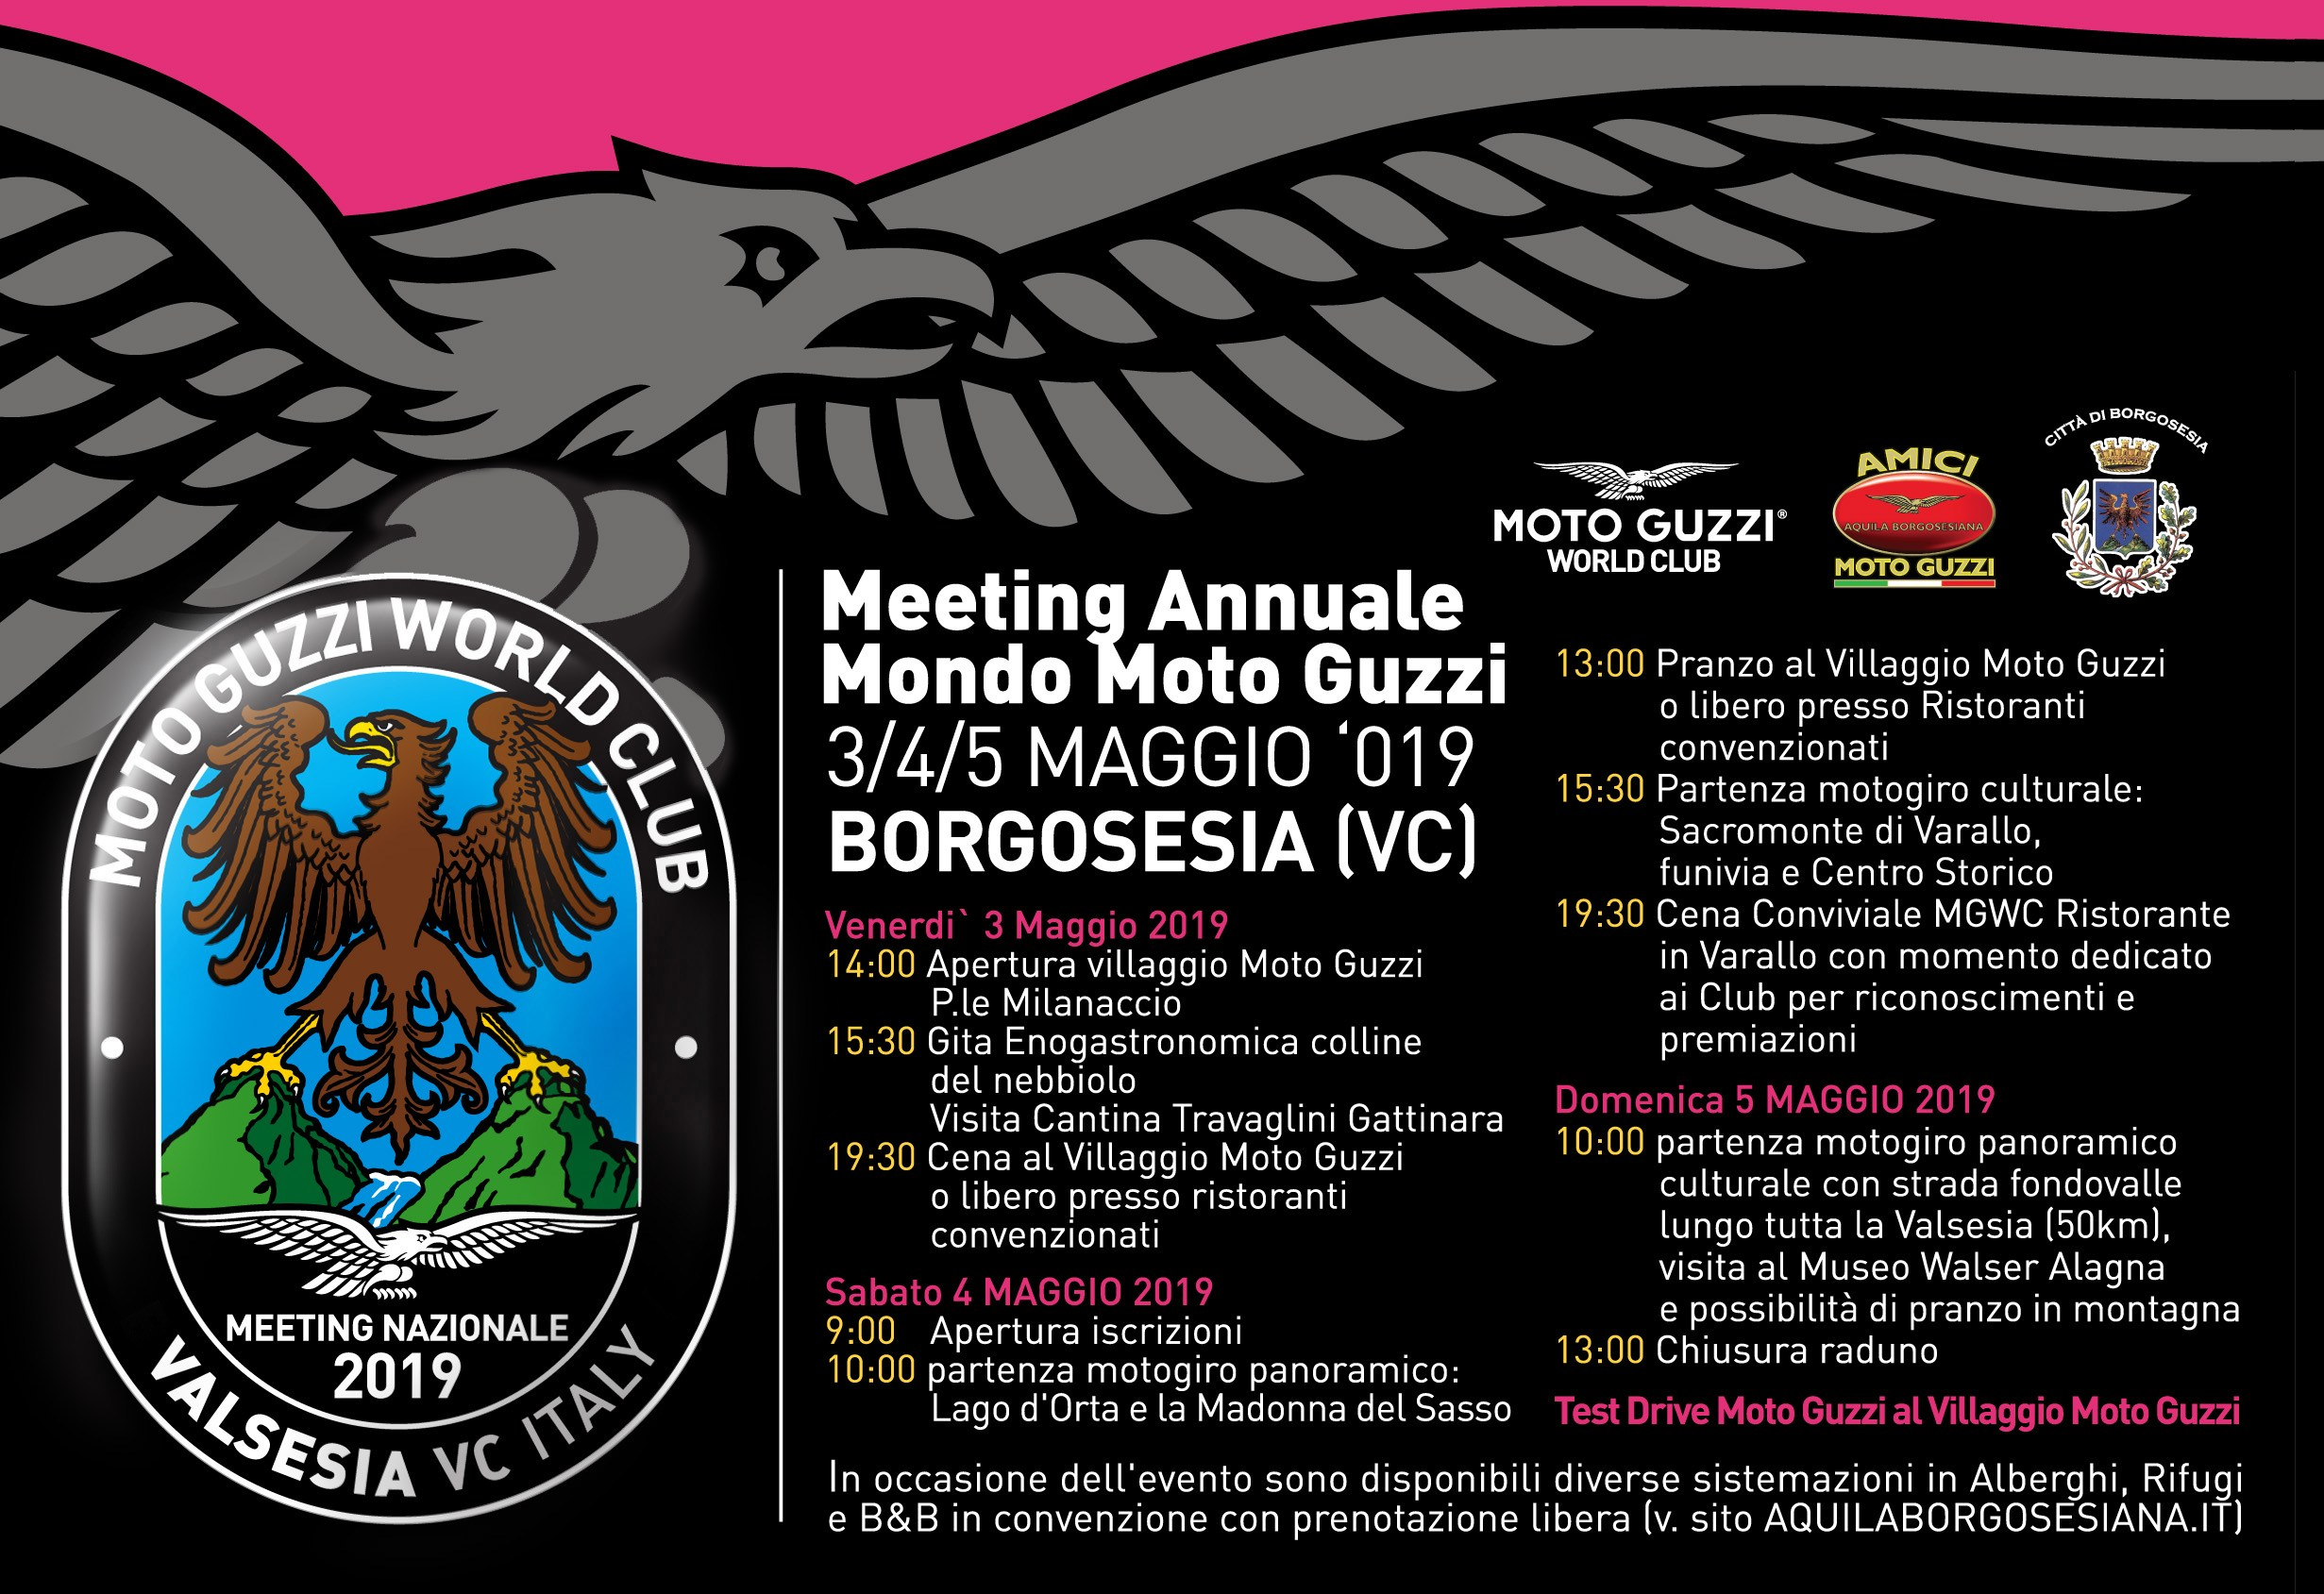 Meeting annuale Moto Guzzi 2019